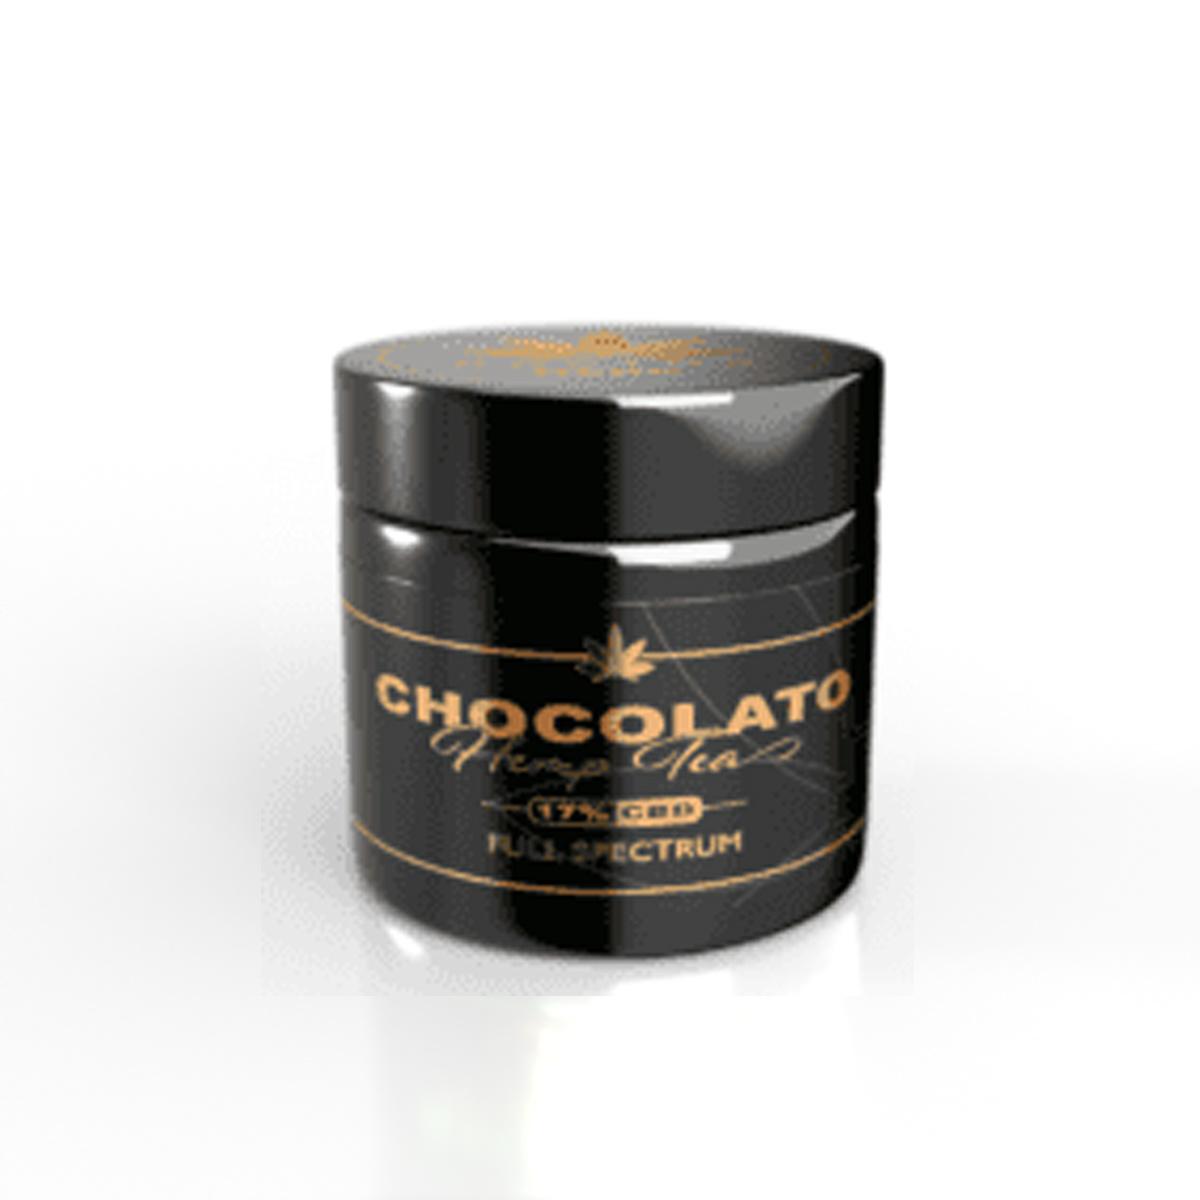 Doctor Herb - Chocolate Hemp Flower - 20% CBD/ 0.02 THC